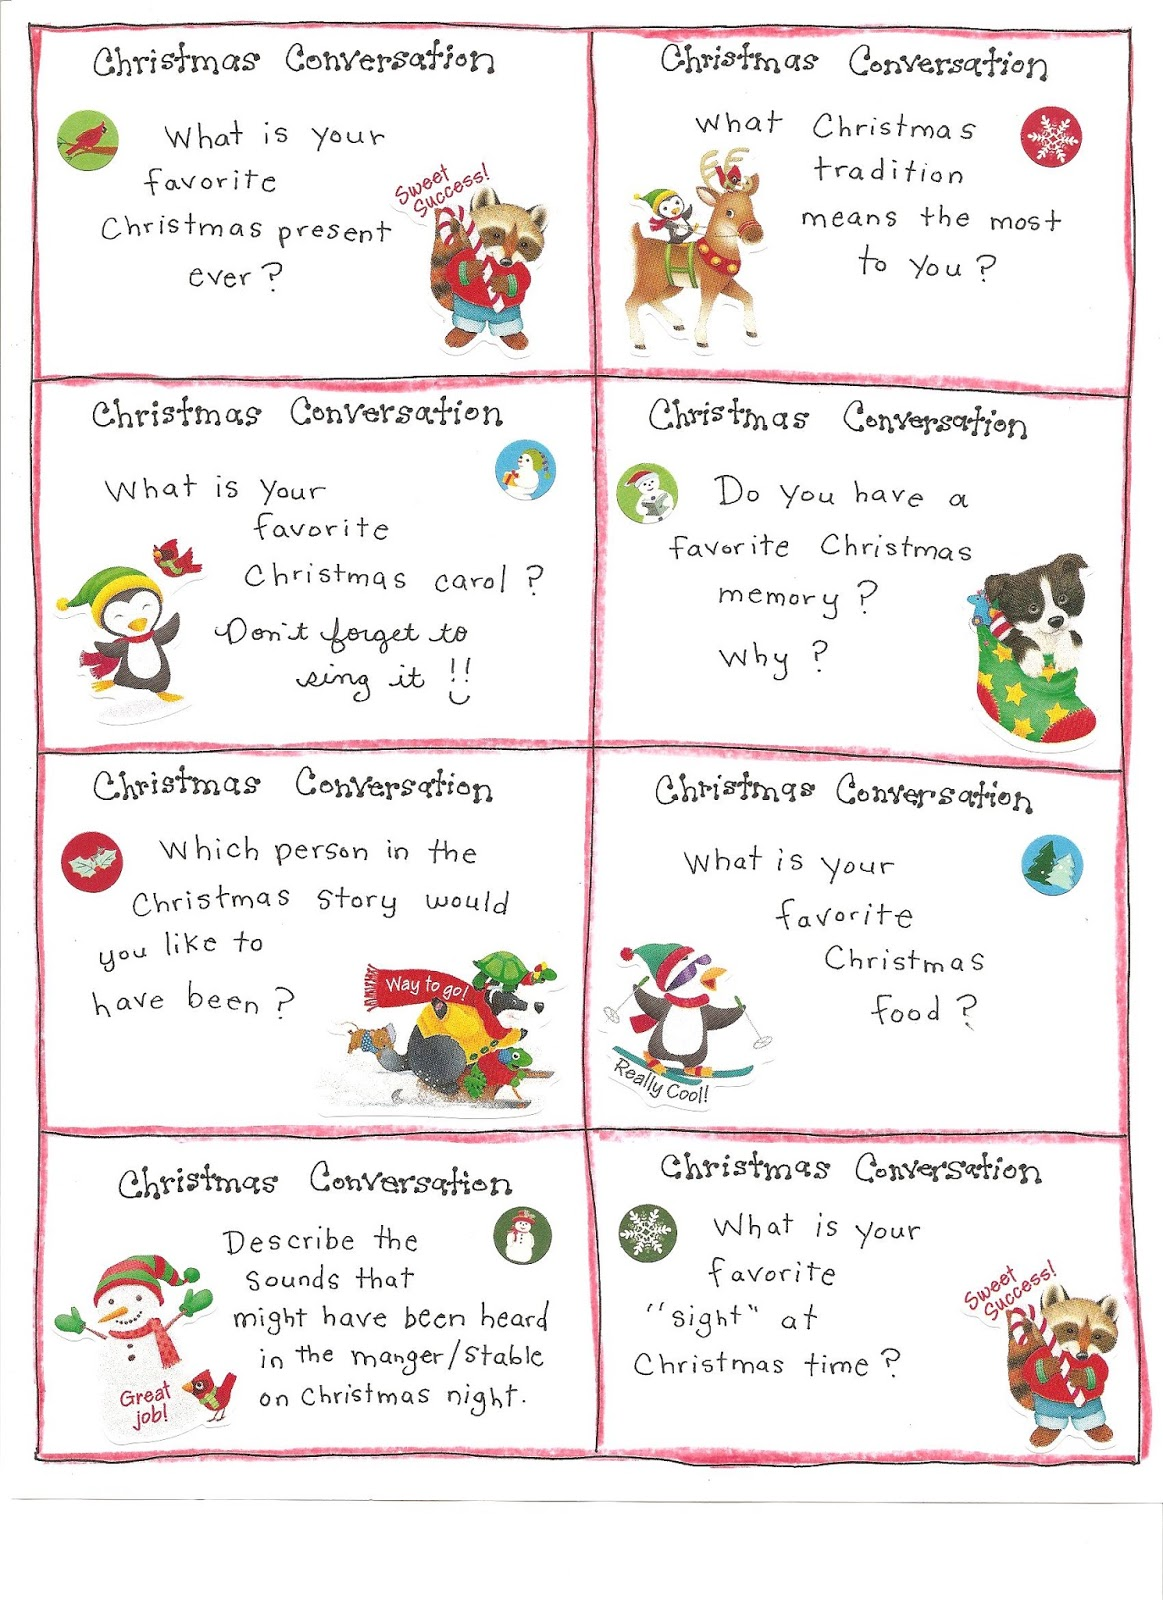 Kindergarten And Mooneyisms Christmas Conversation